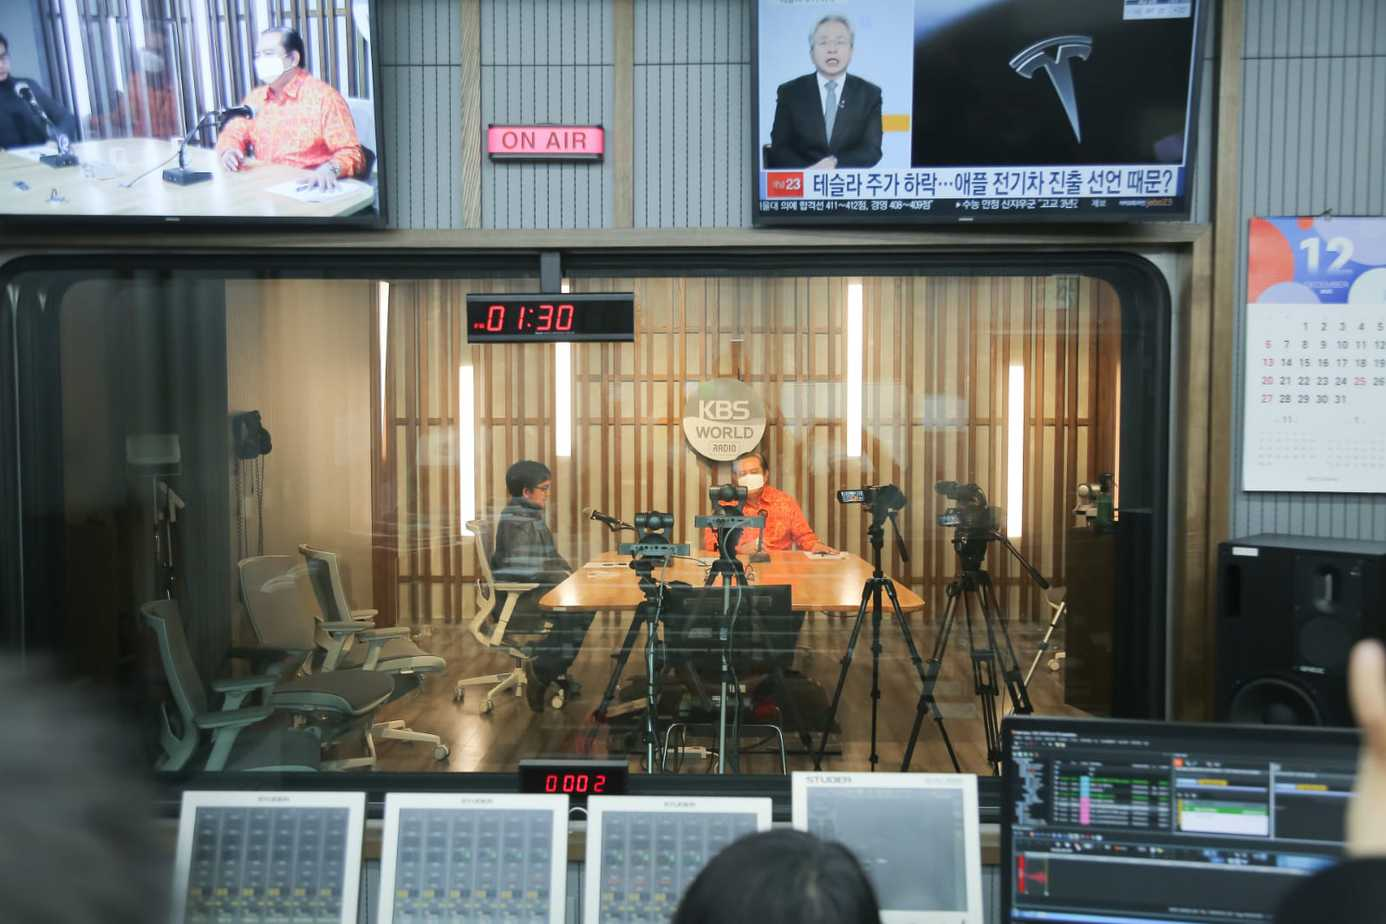 Mewawancarai Duta Besar RI untuk Korsel di Siaran Akhir Tahun KBS World Radio.